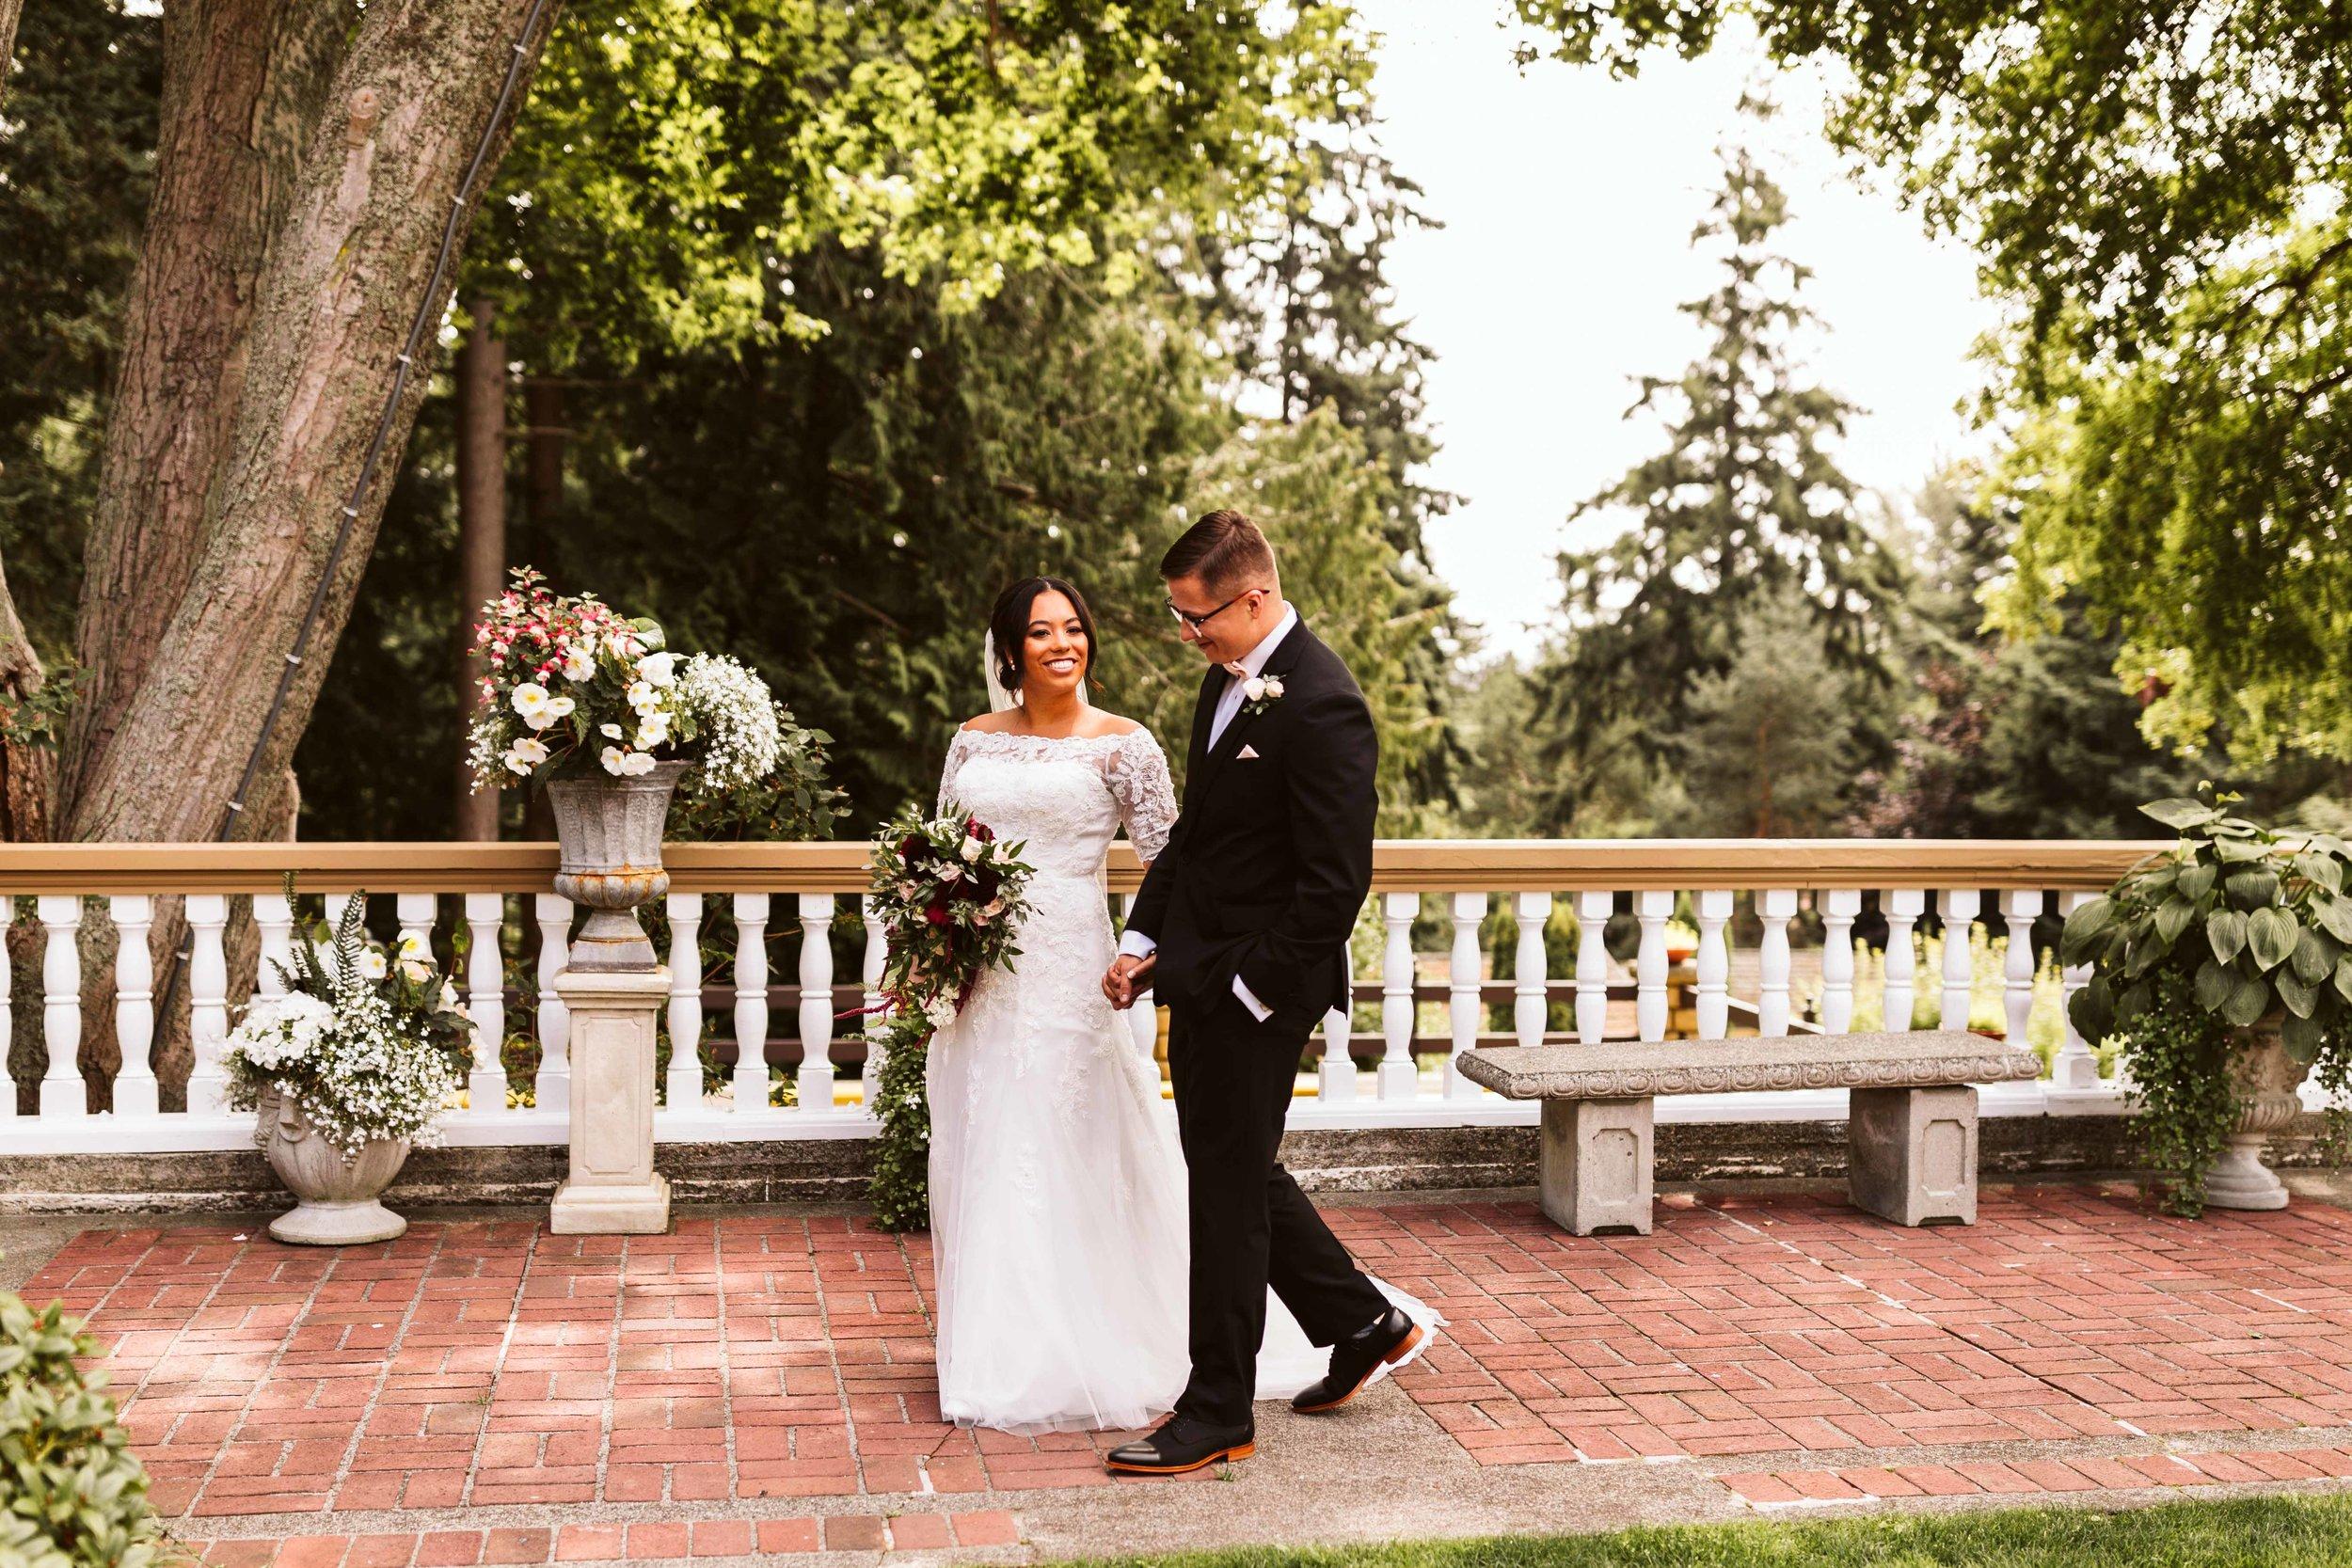 lairmont-manor-wedding-26.jpg